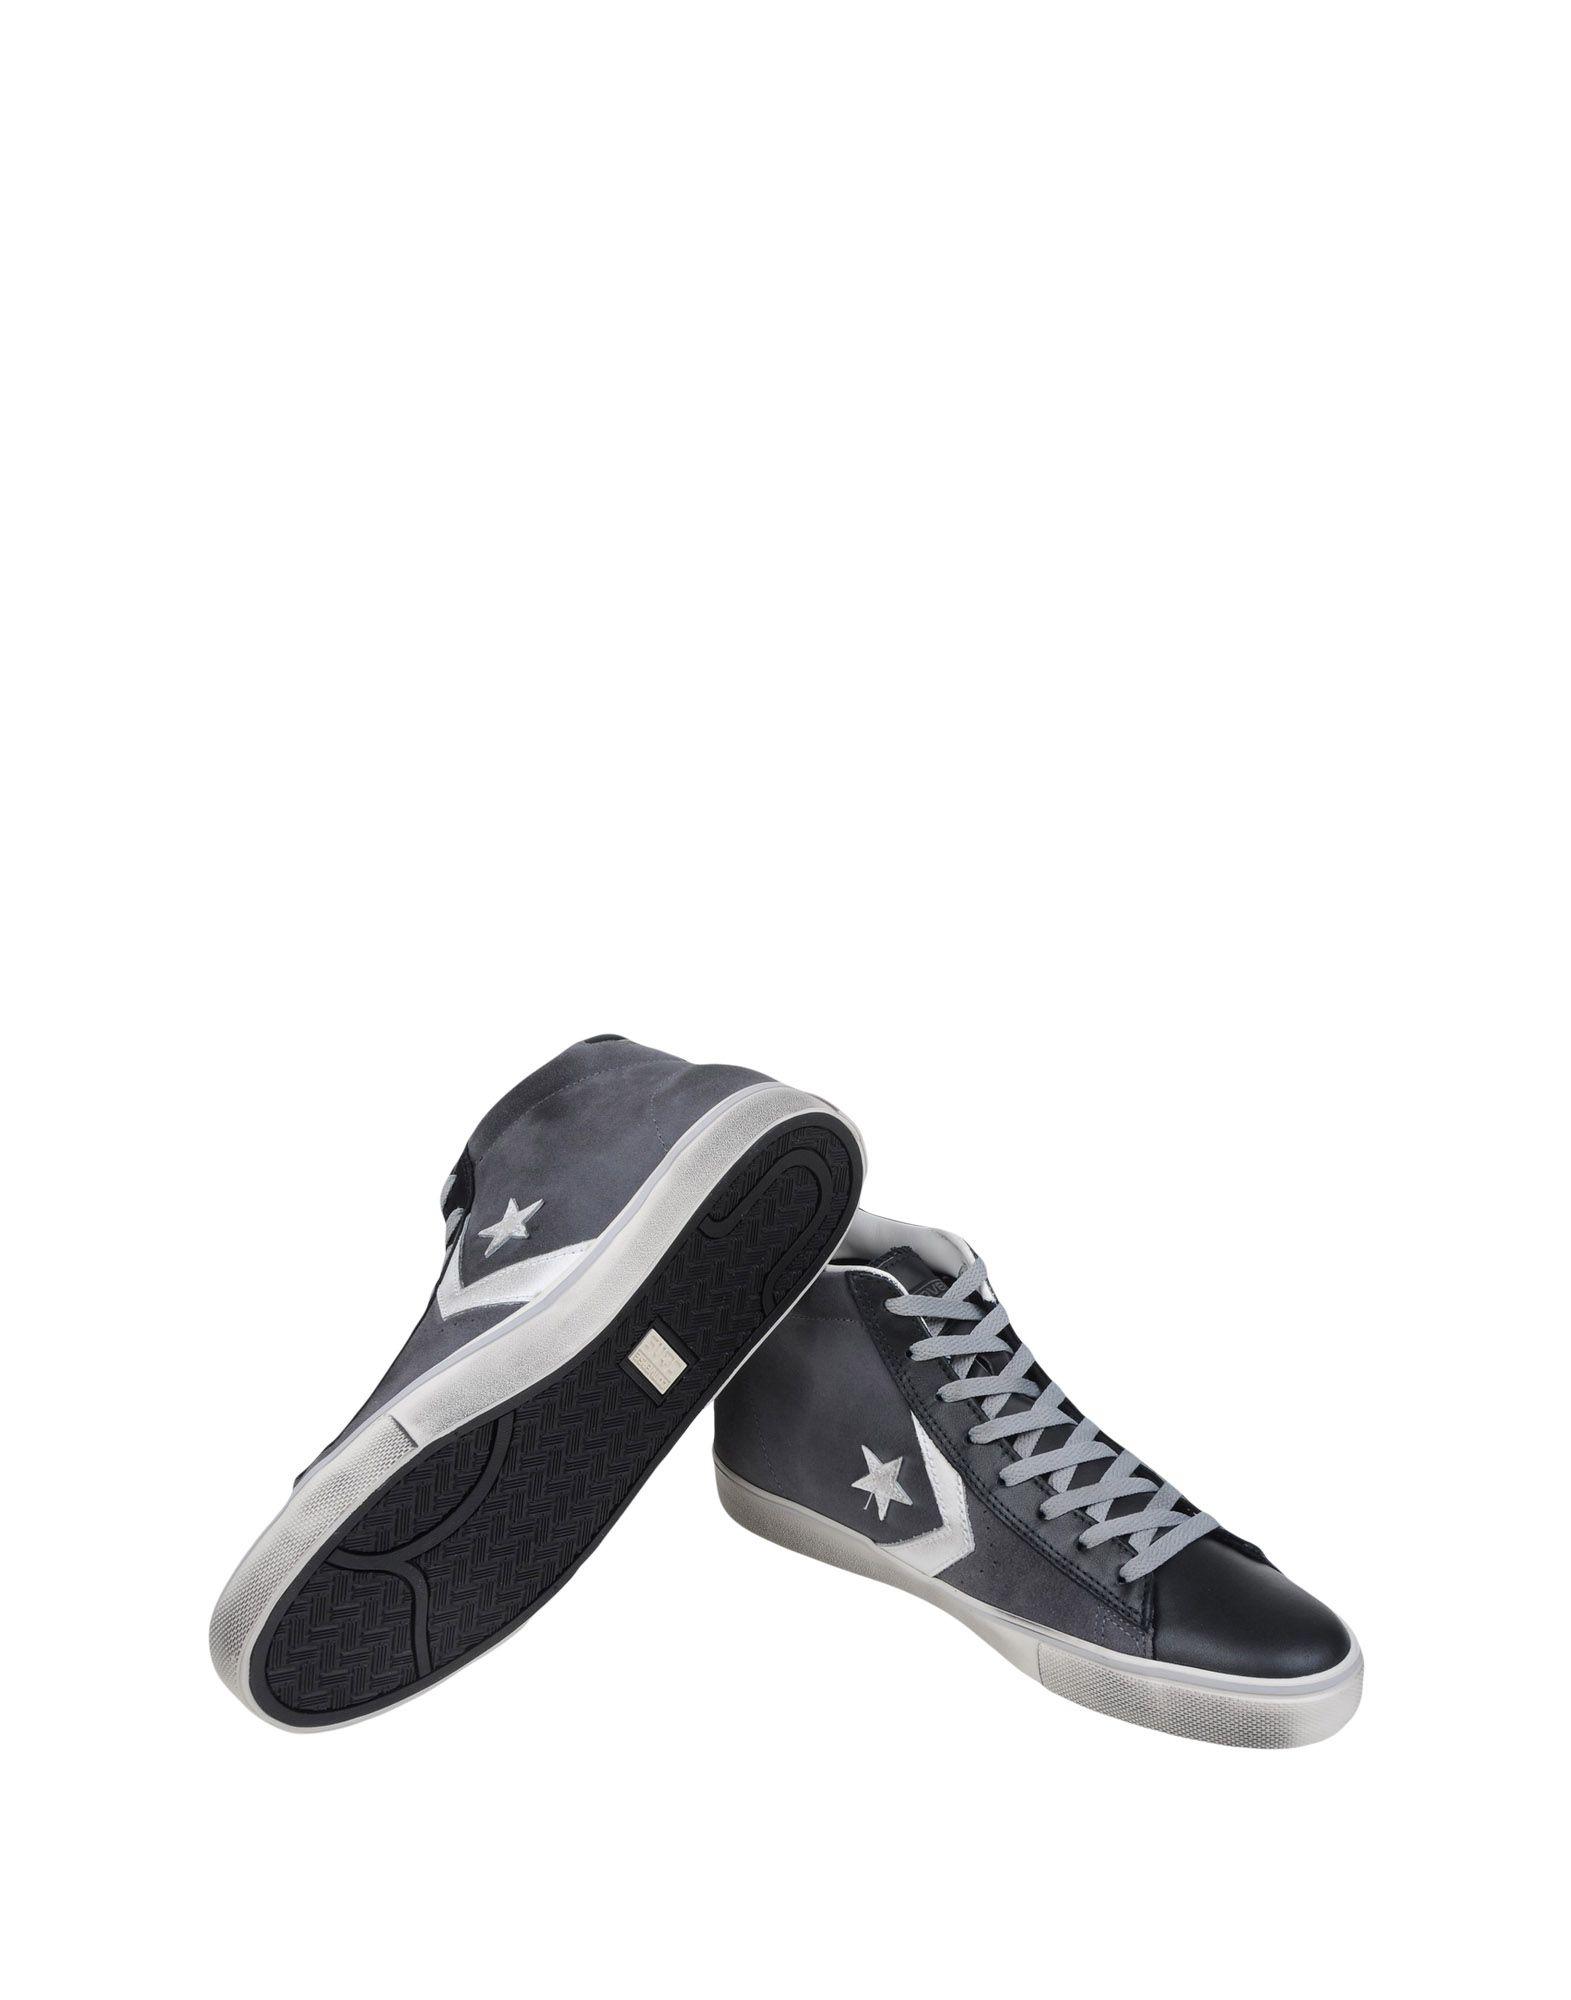 Vulc Converse Cons Pro Leather Vulc  Mid Suede/Lea  11114020FO 6dea16